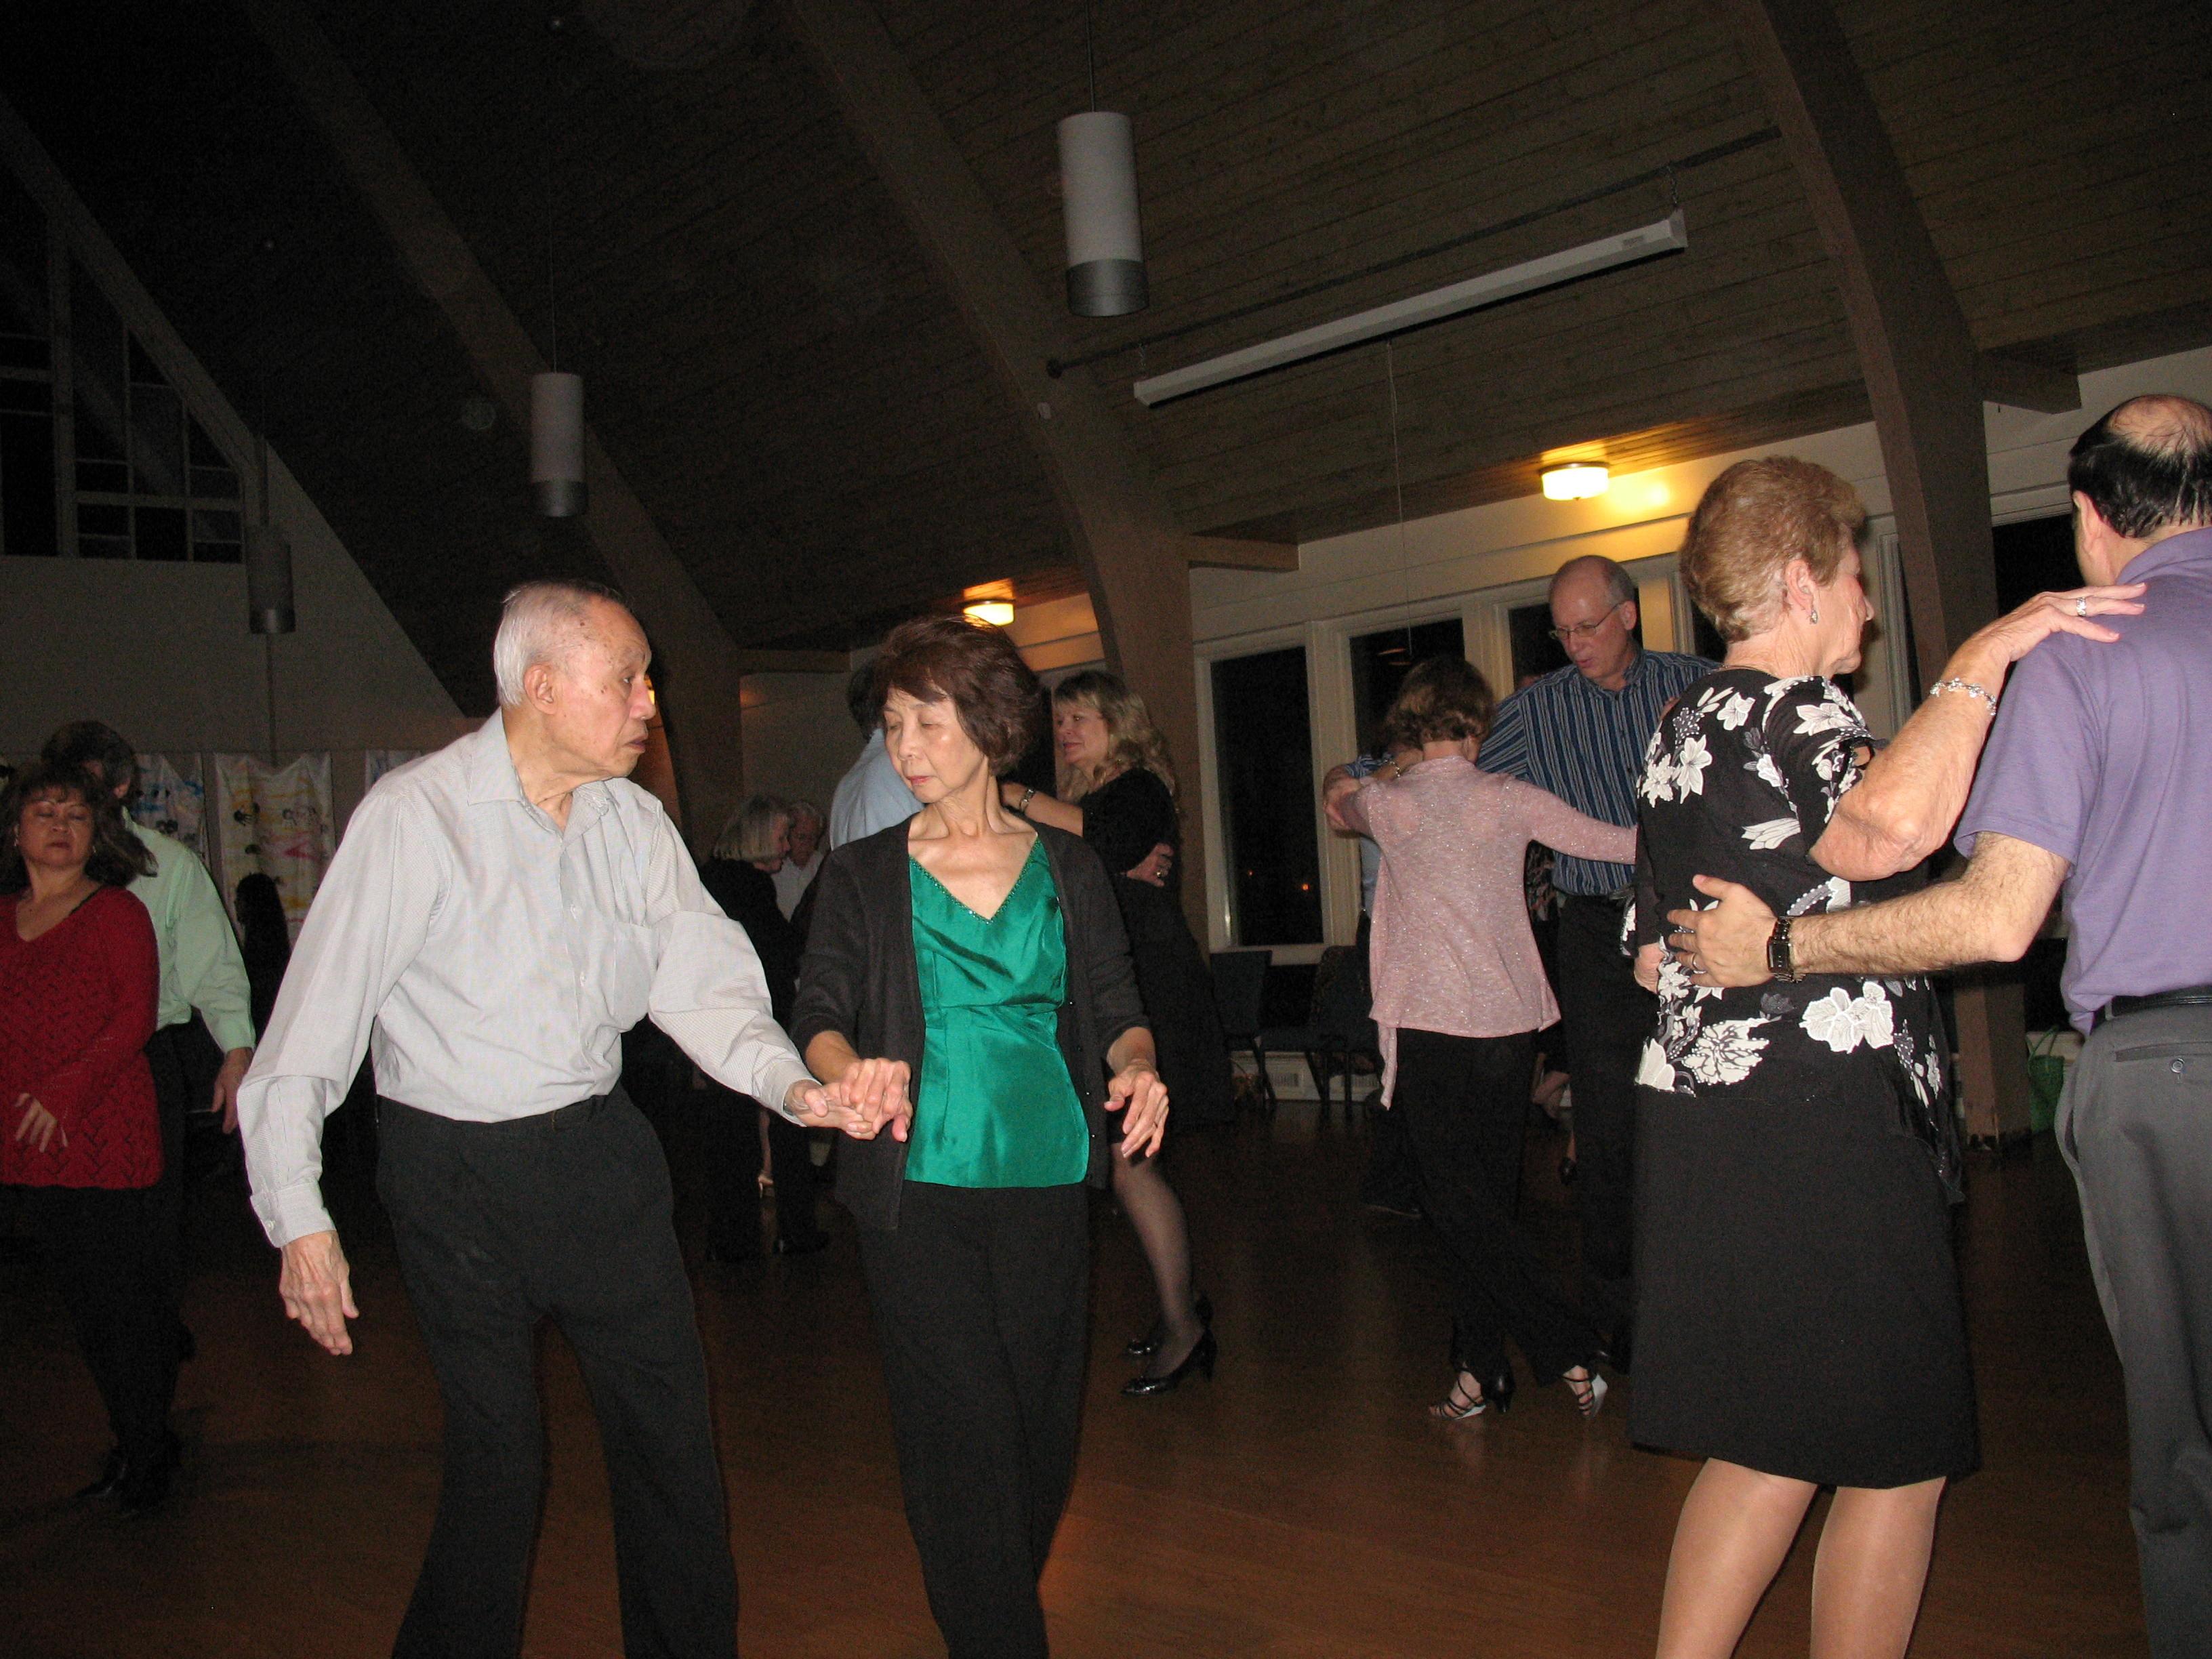 2014 January 11th dance